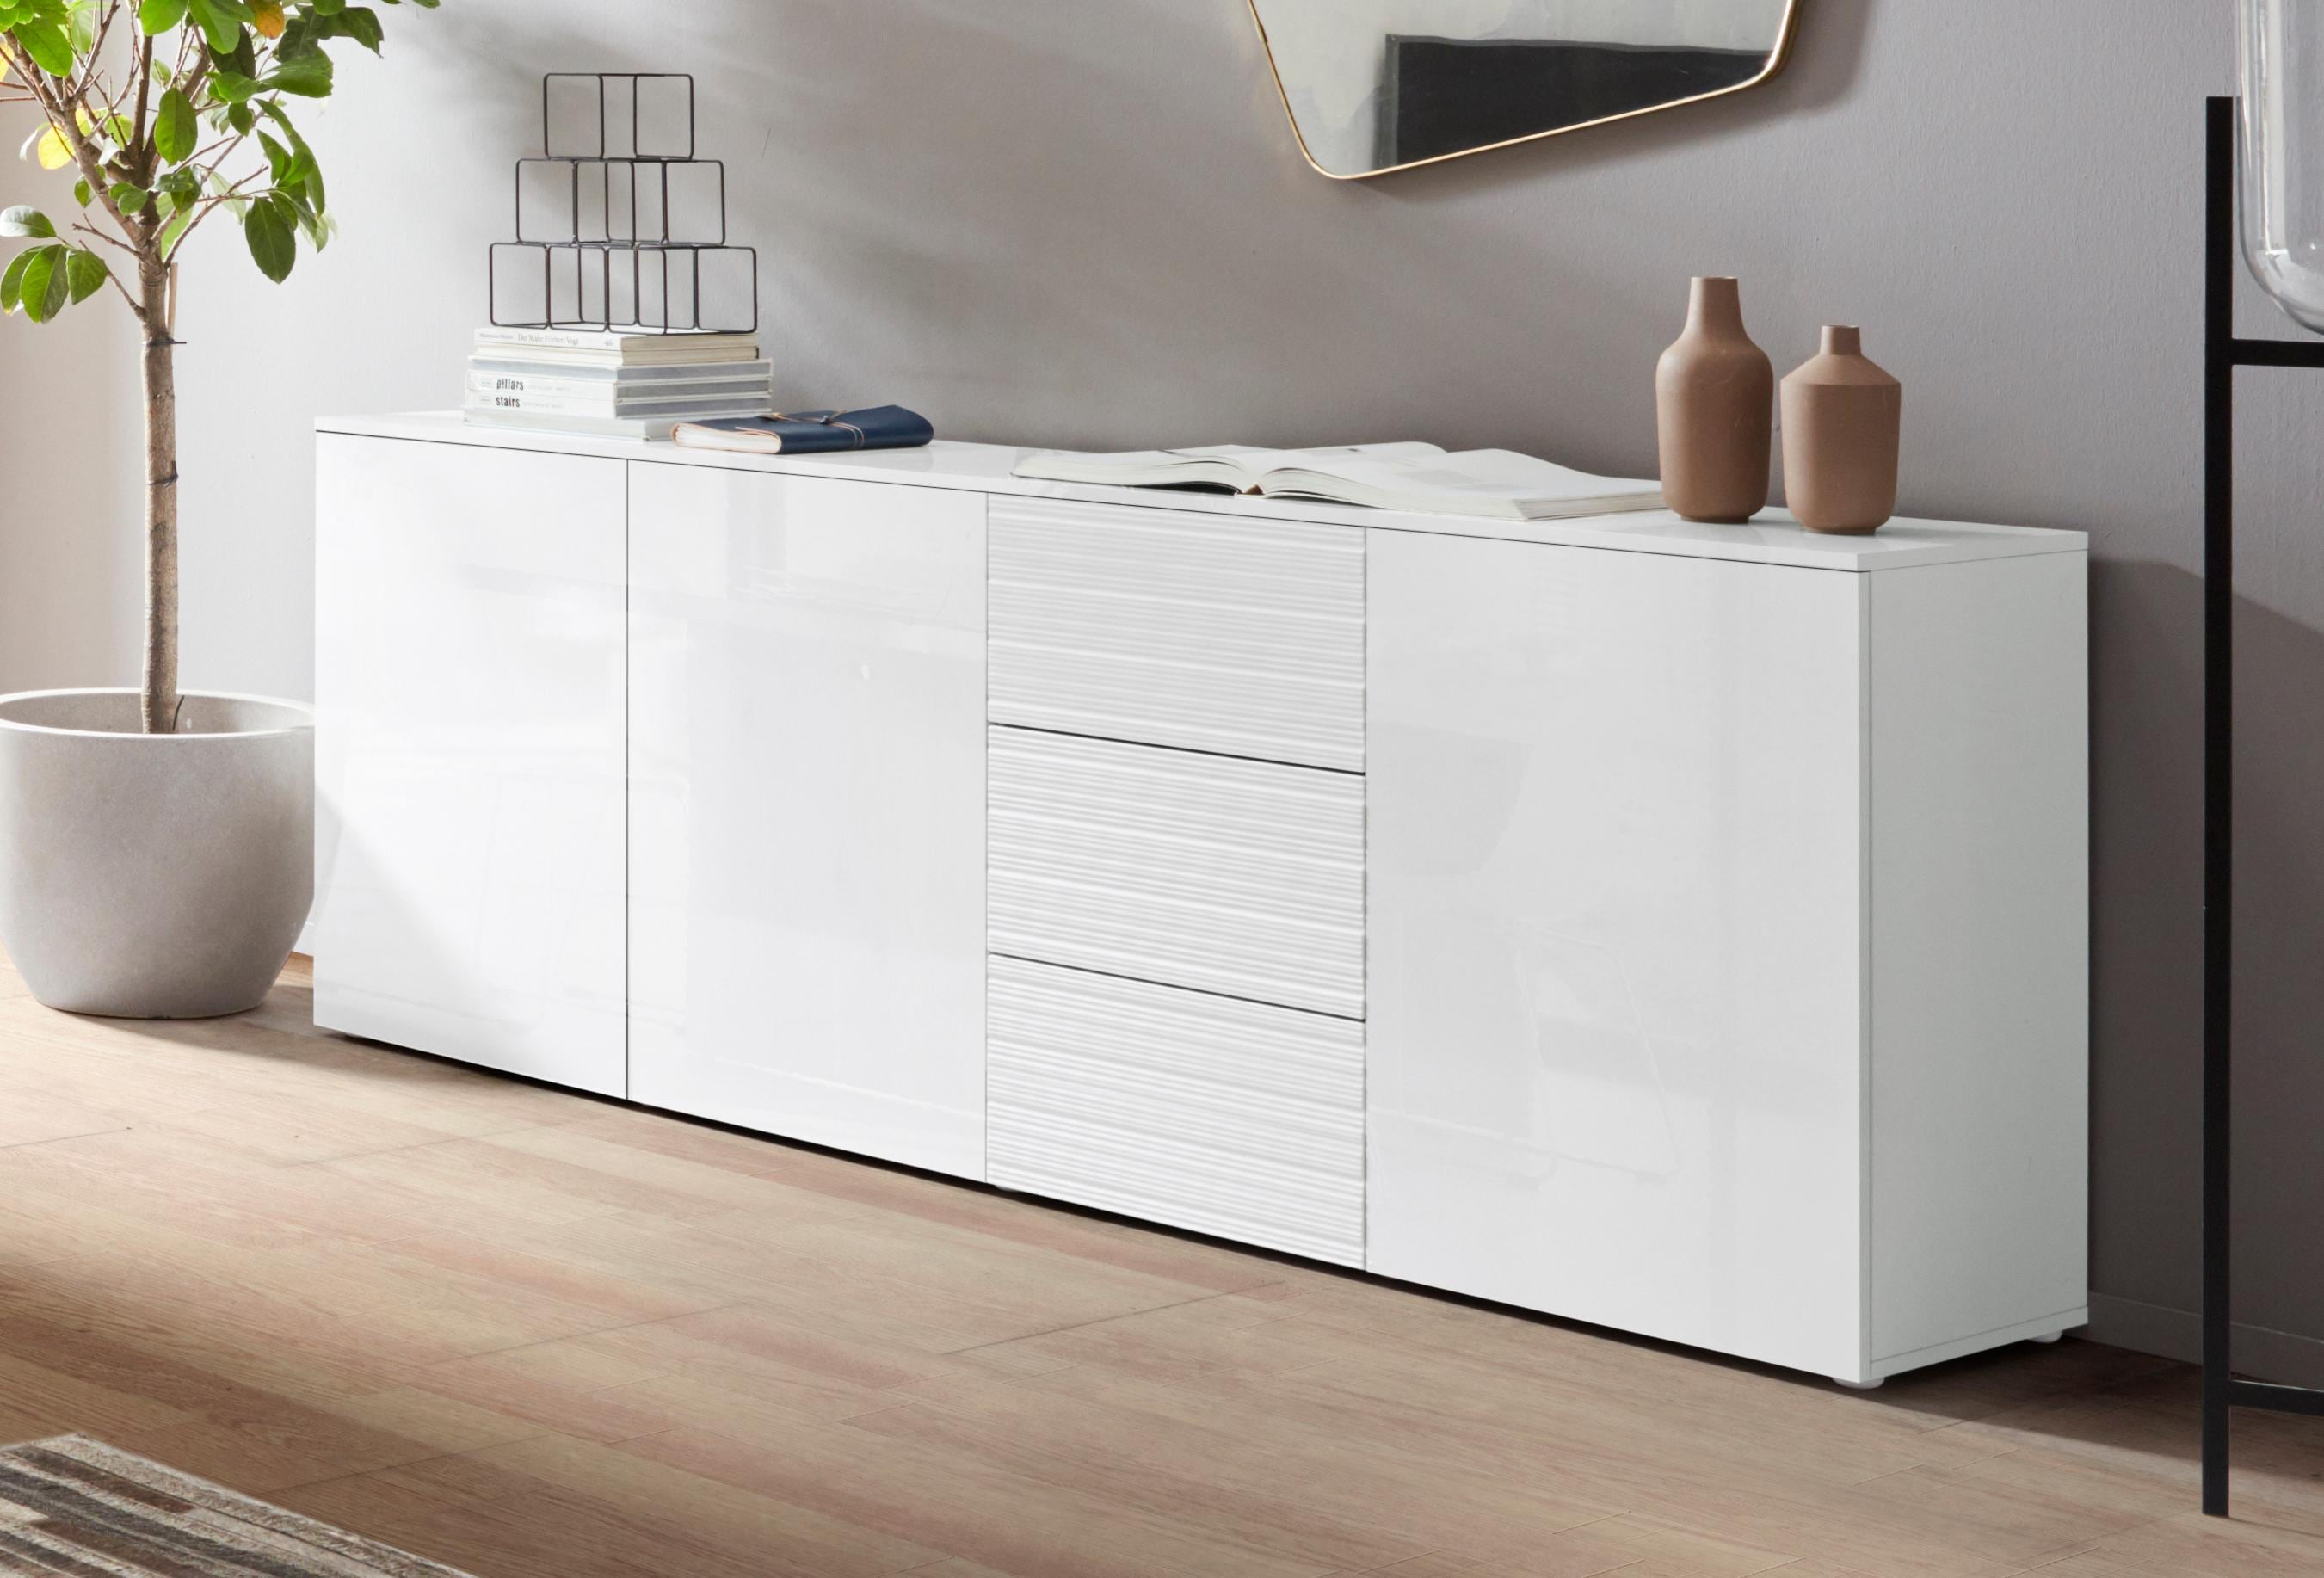 sideboard savannah breite 200 cm mtec metall. Black Bedroom Furniture Sets. Home Design Ideas